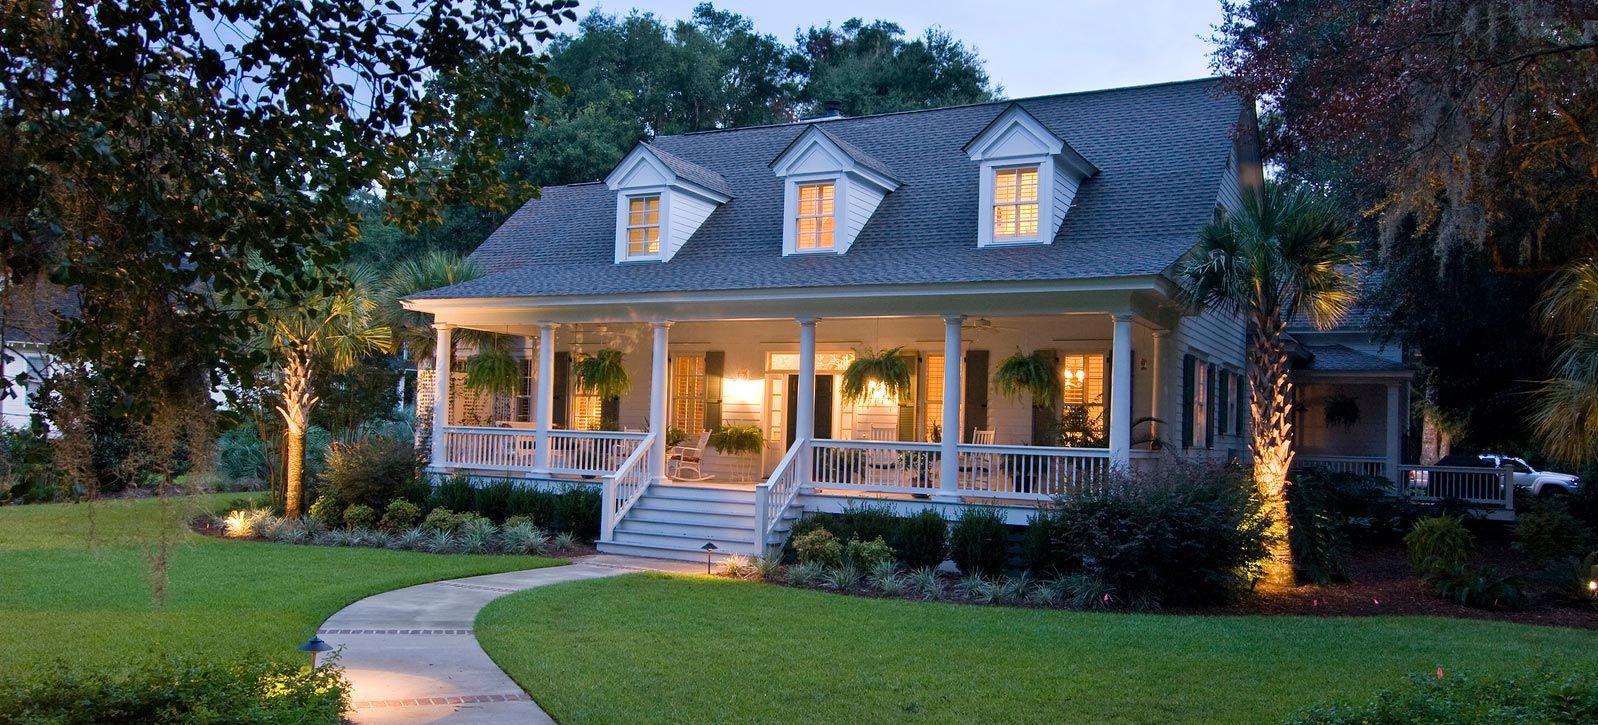 Real Estate For Sale In Farmington Missouri Arnold